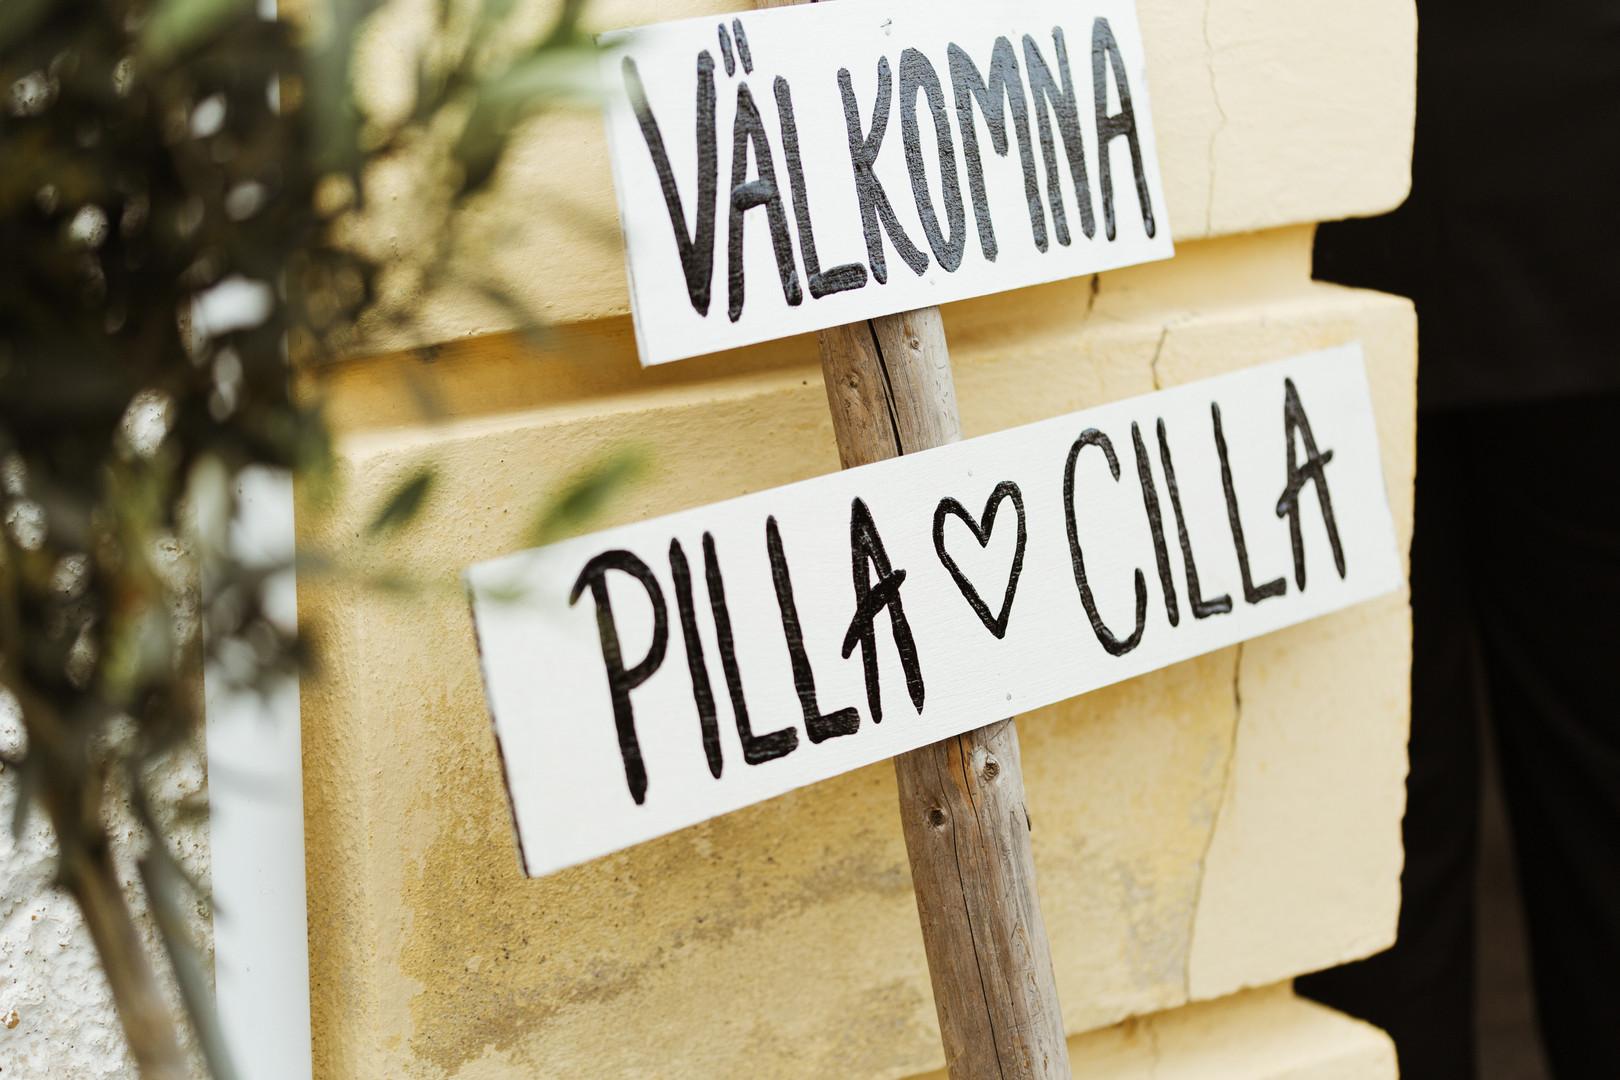 Pilla_Cilla_261.jpg